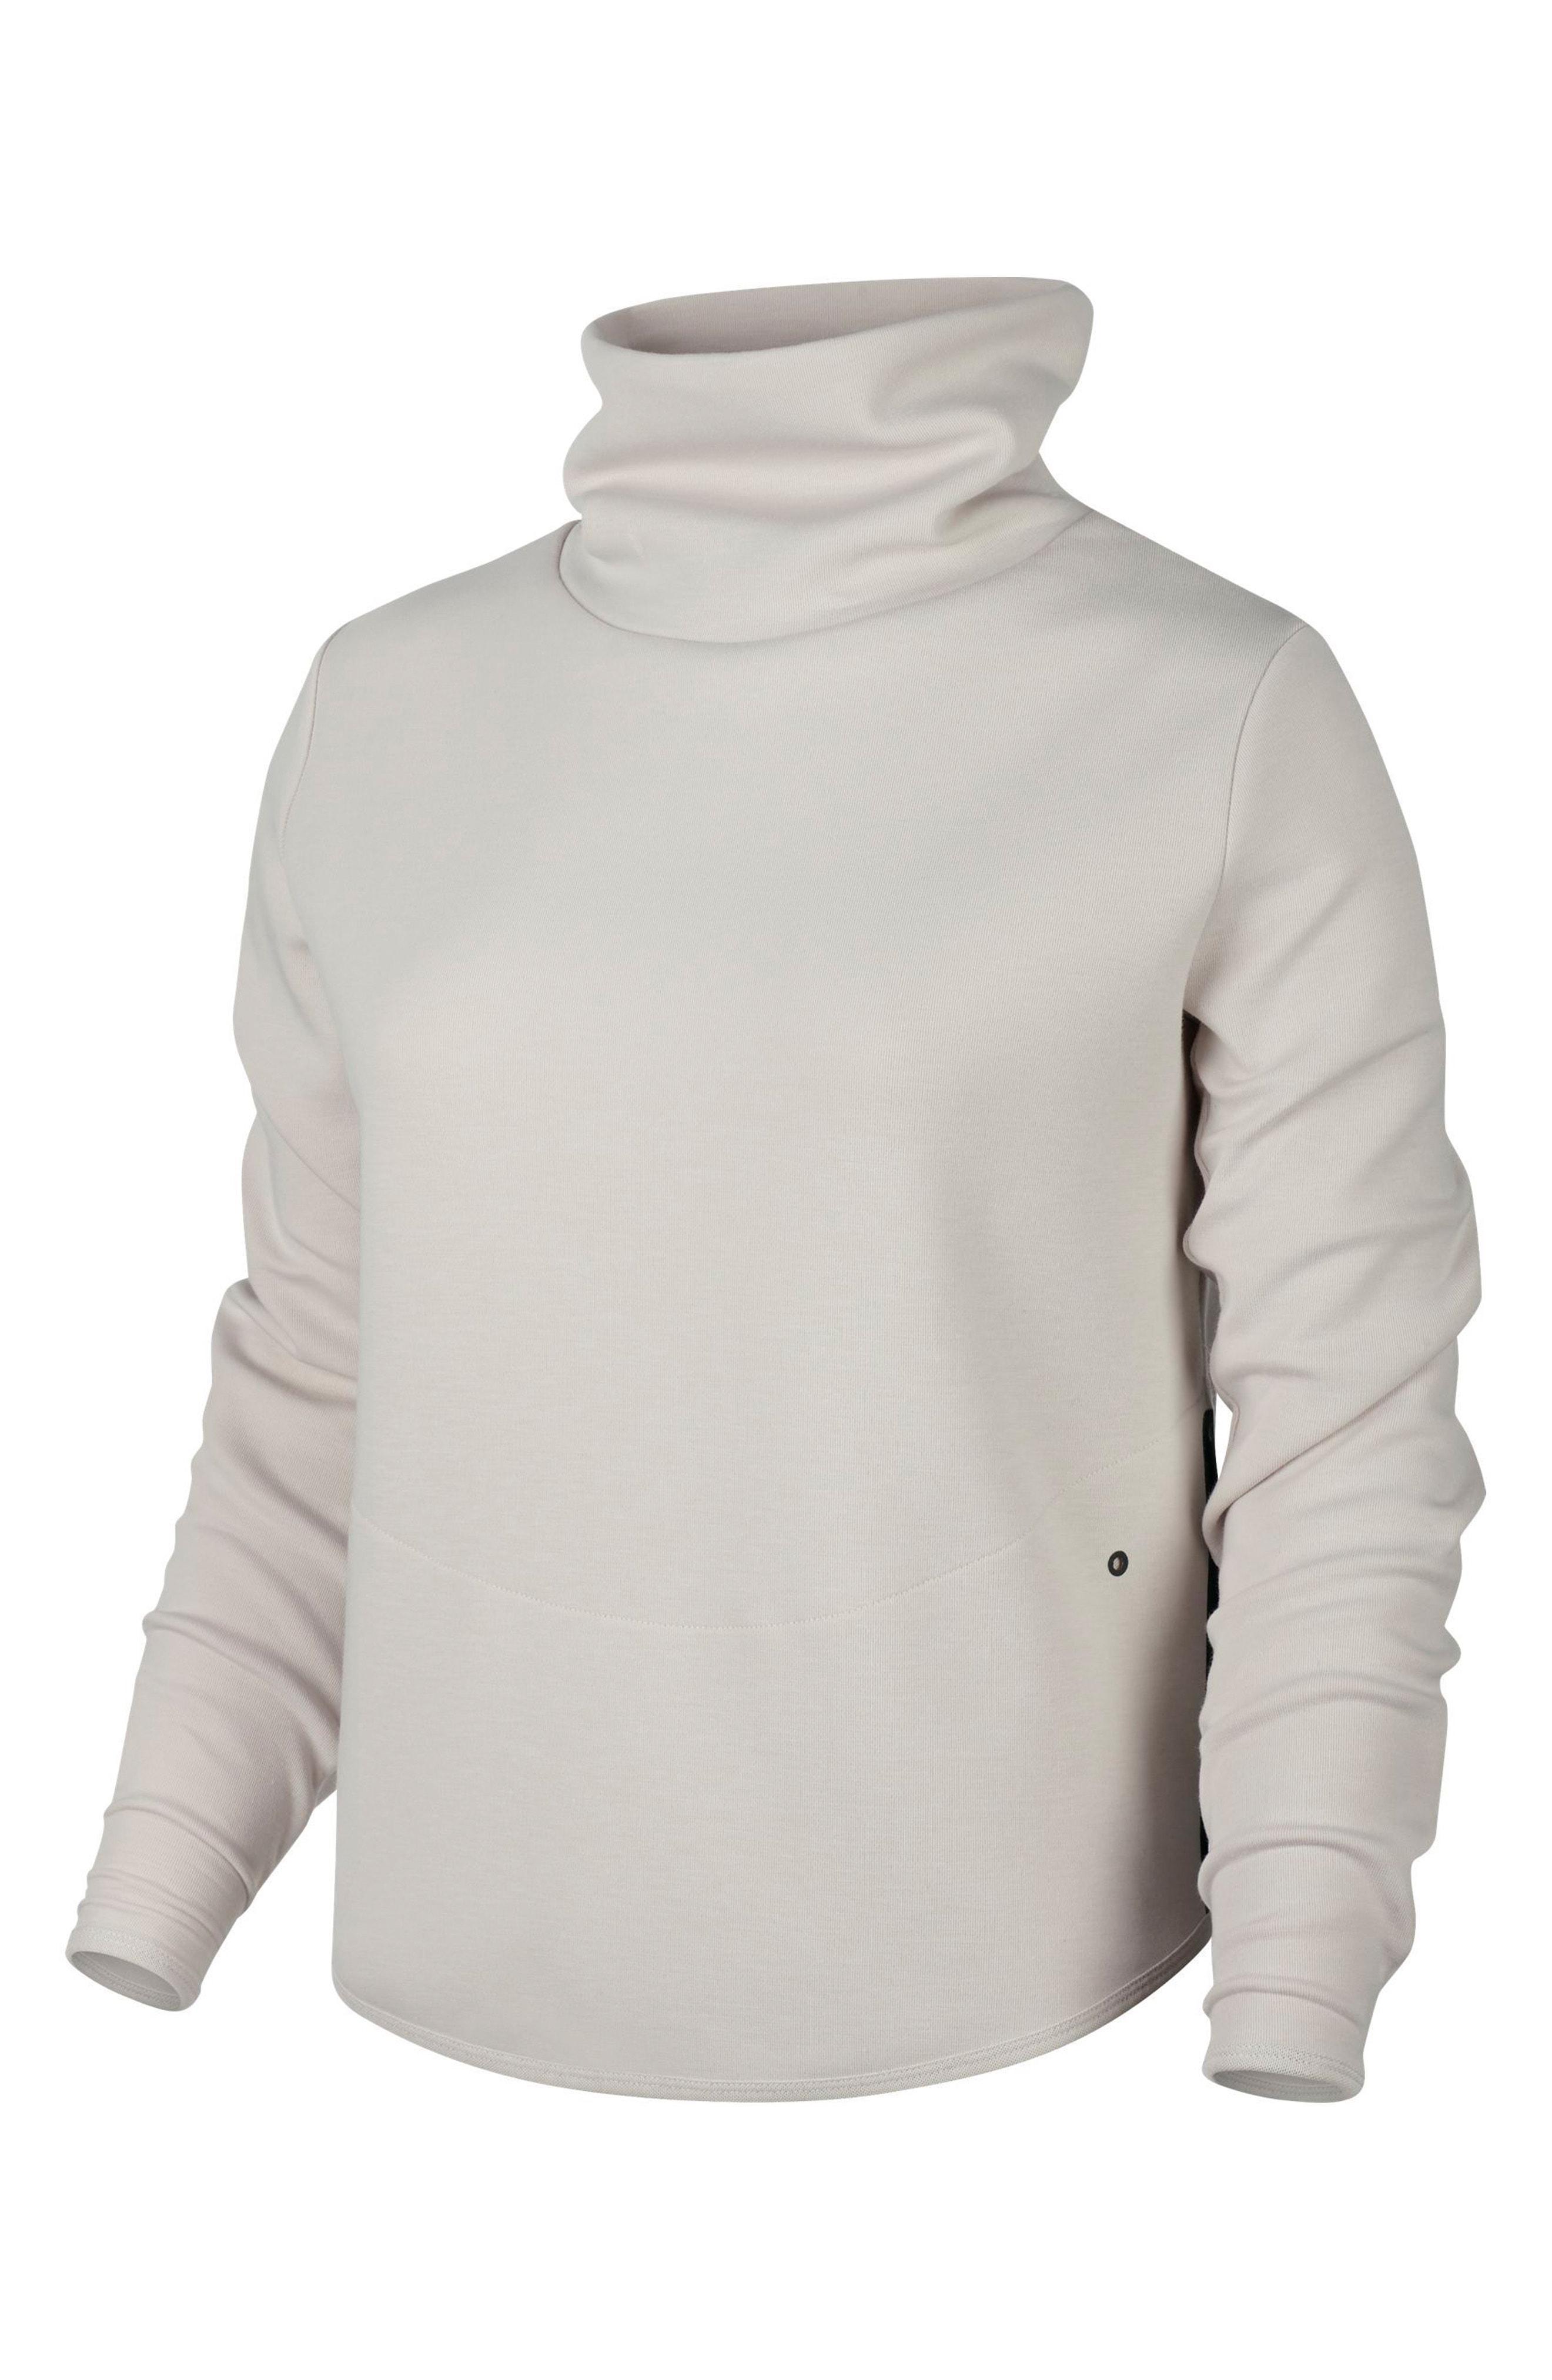 8da28ba6 Lyst - Nike Women's Thermal Pullover Training Top in Gray